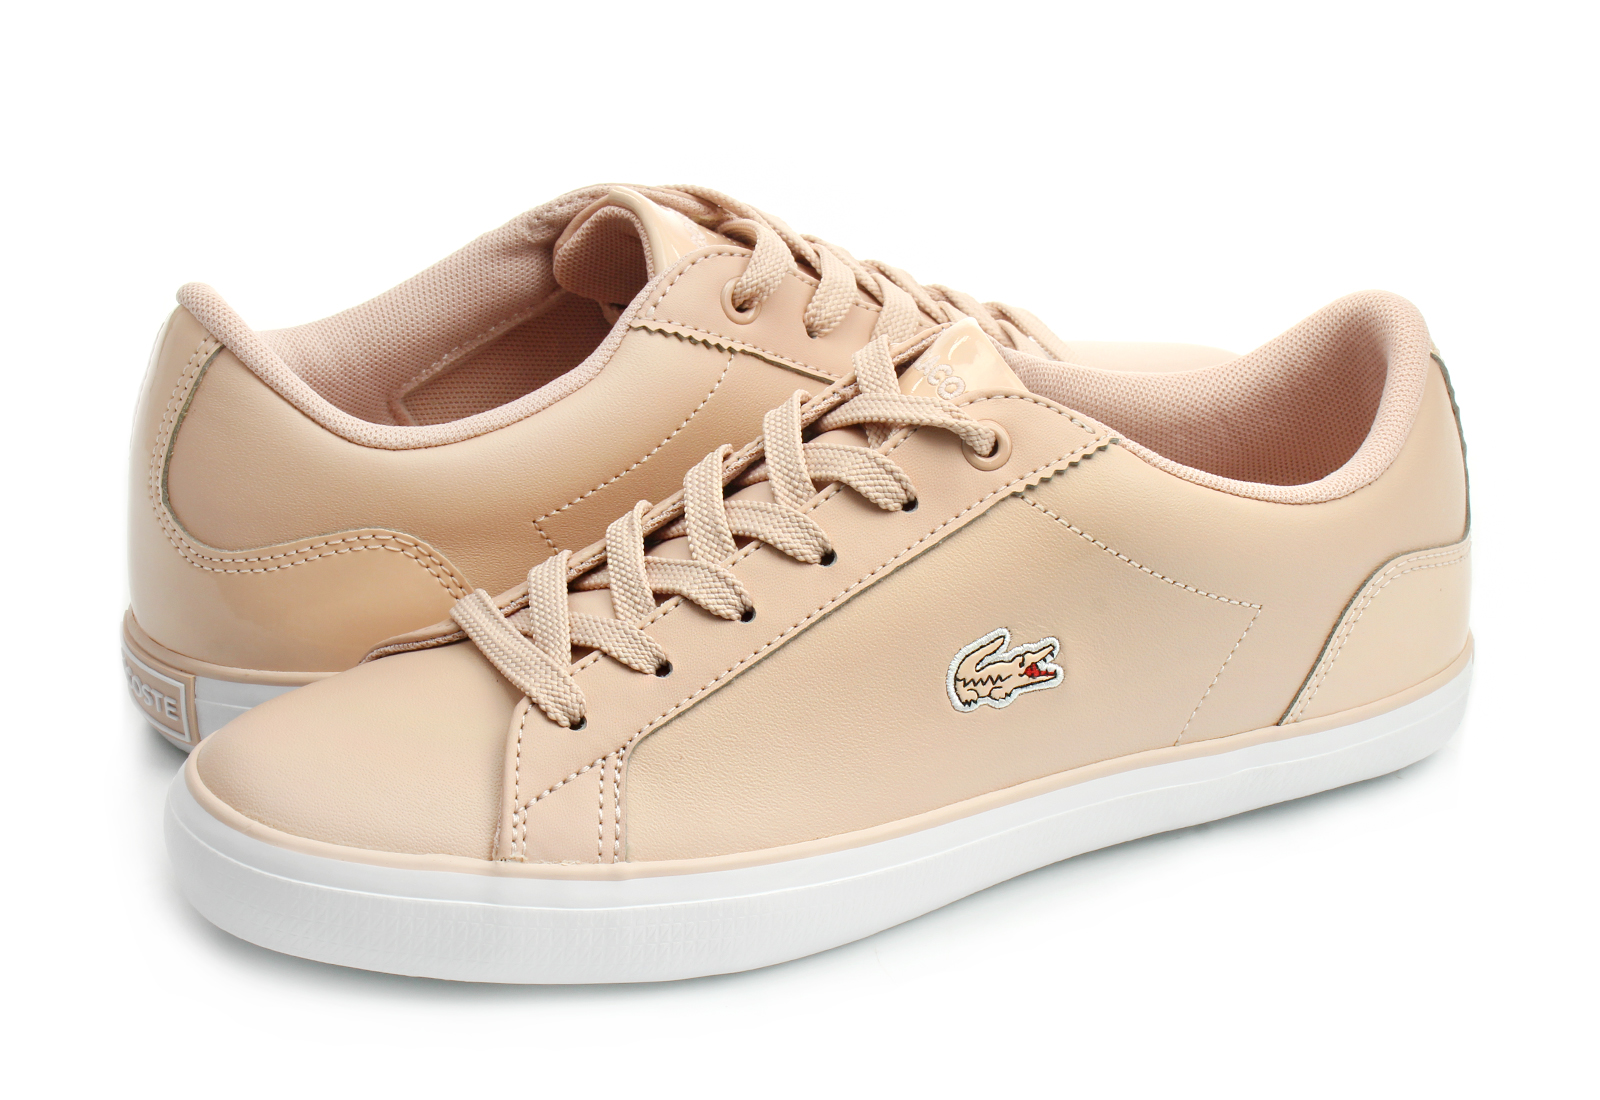 Lacoste Cipő - Lerond - 182caw0093-a75 - Office Shoes Magyarország e12e4dc865